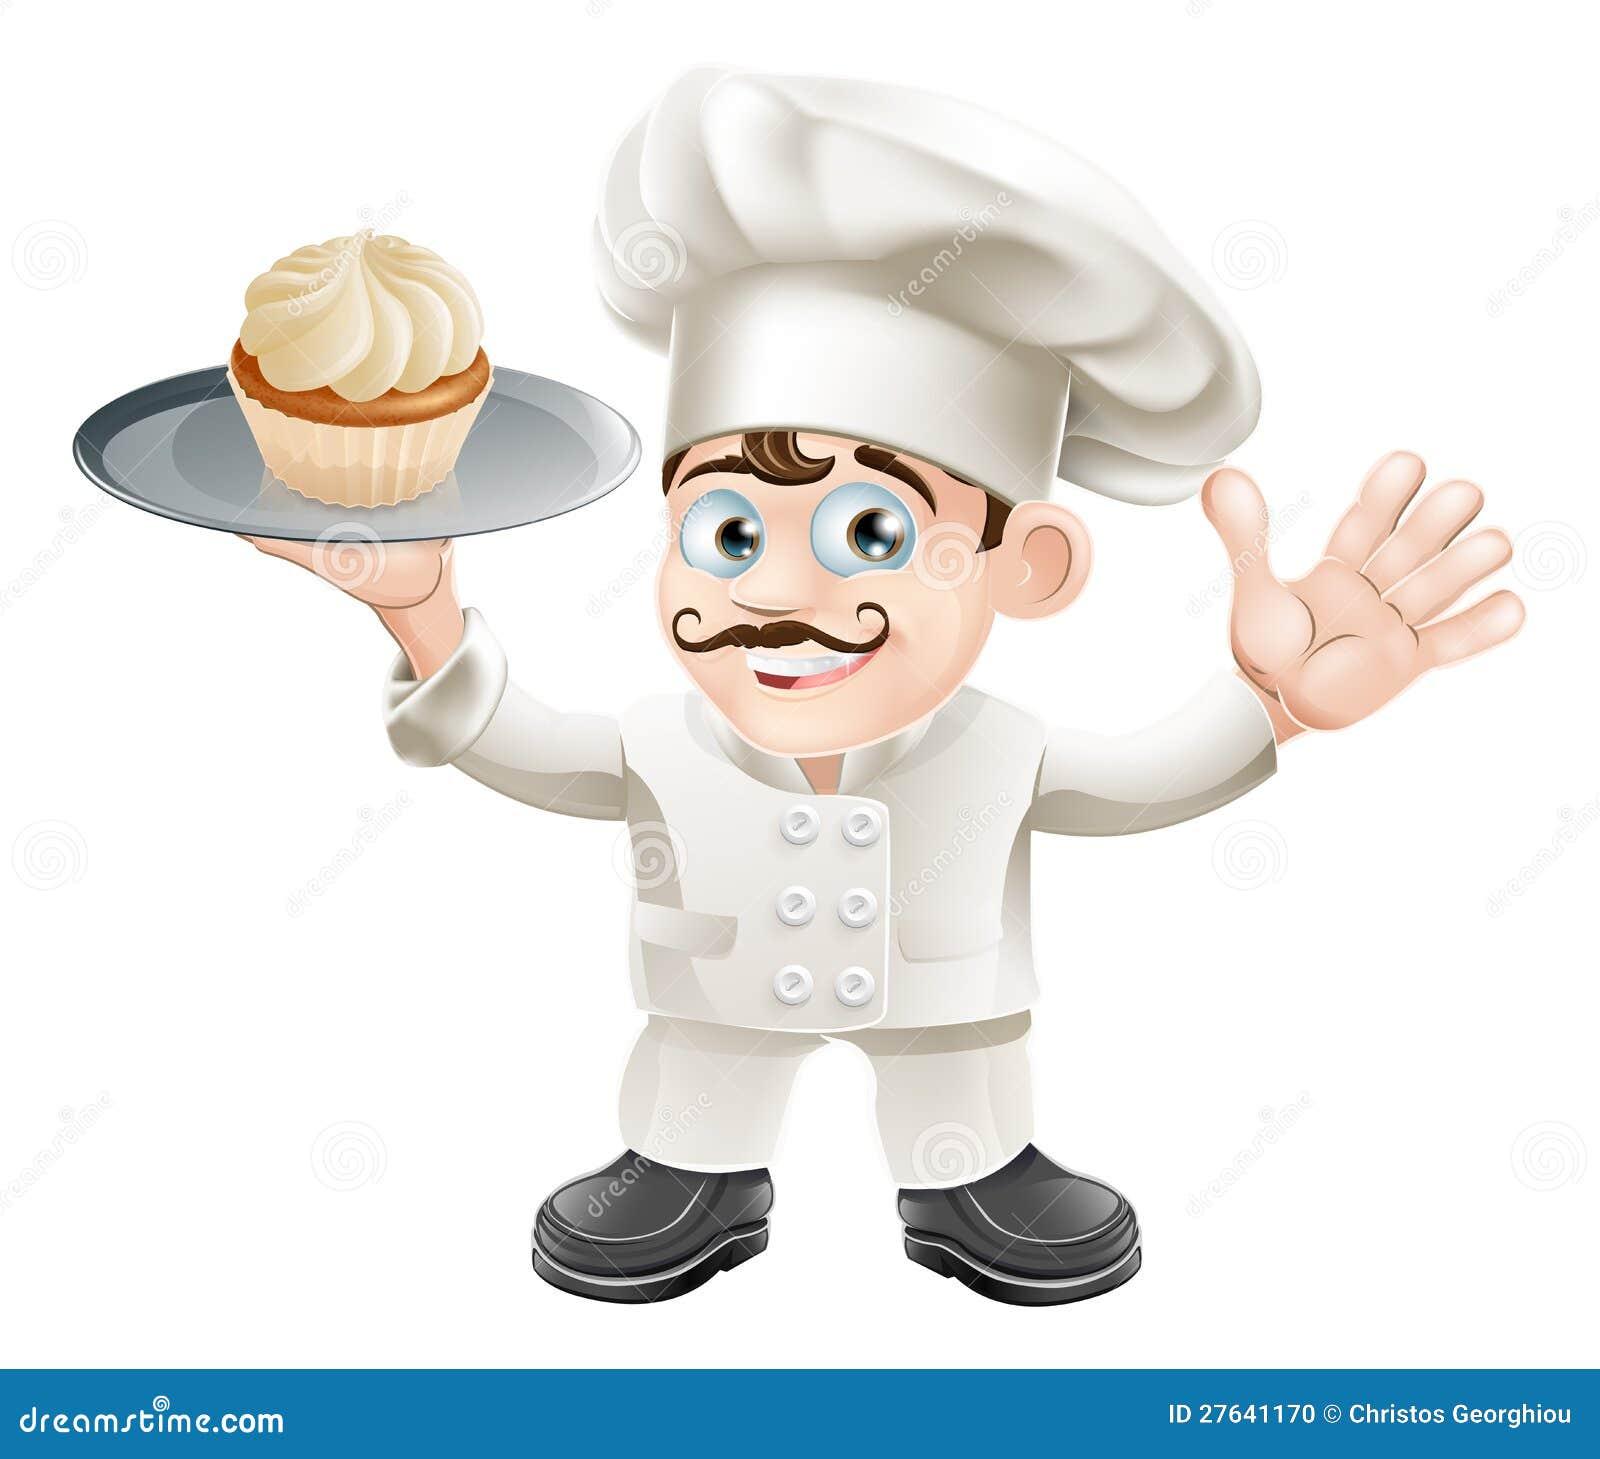 Cake Chef Bakery